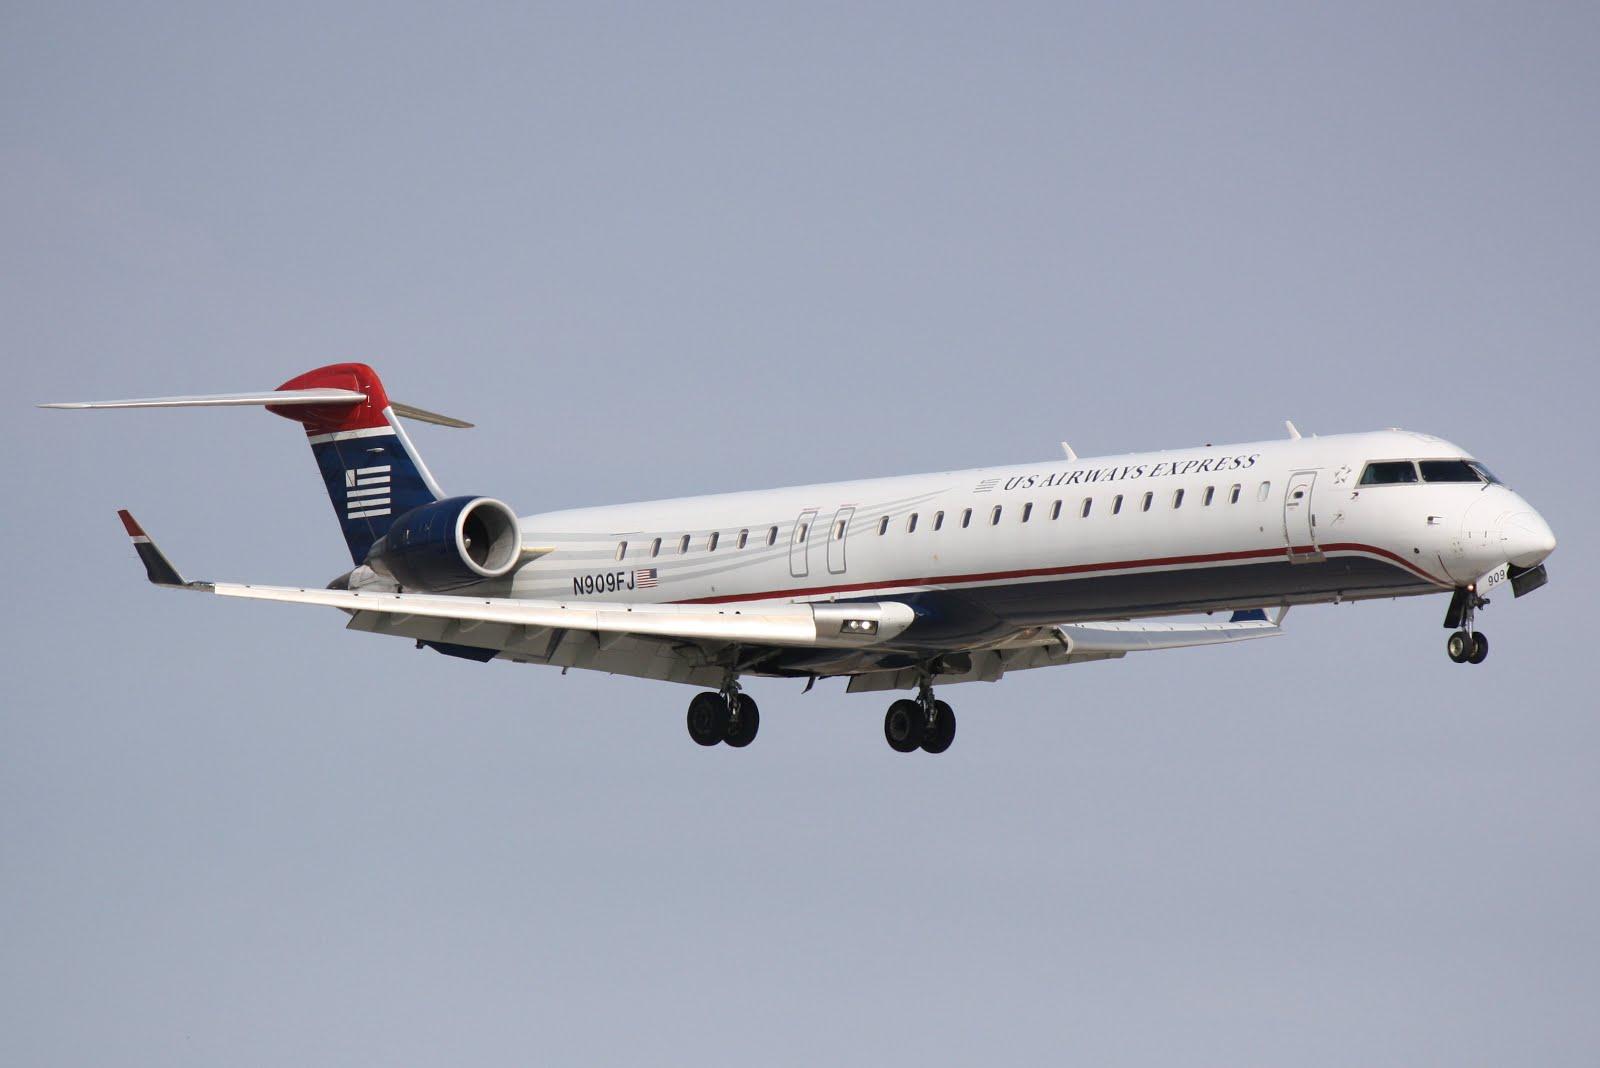 Canadair Regional Jet 900